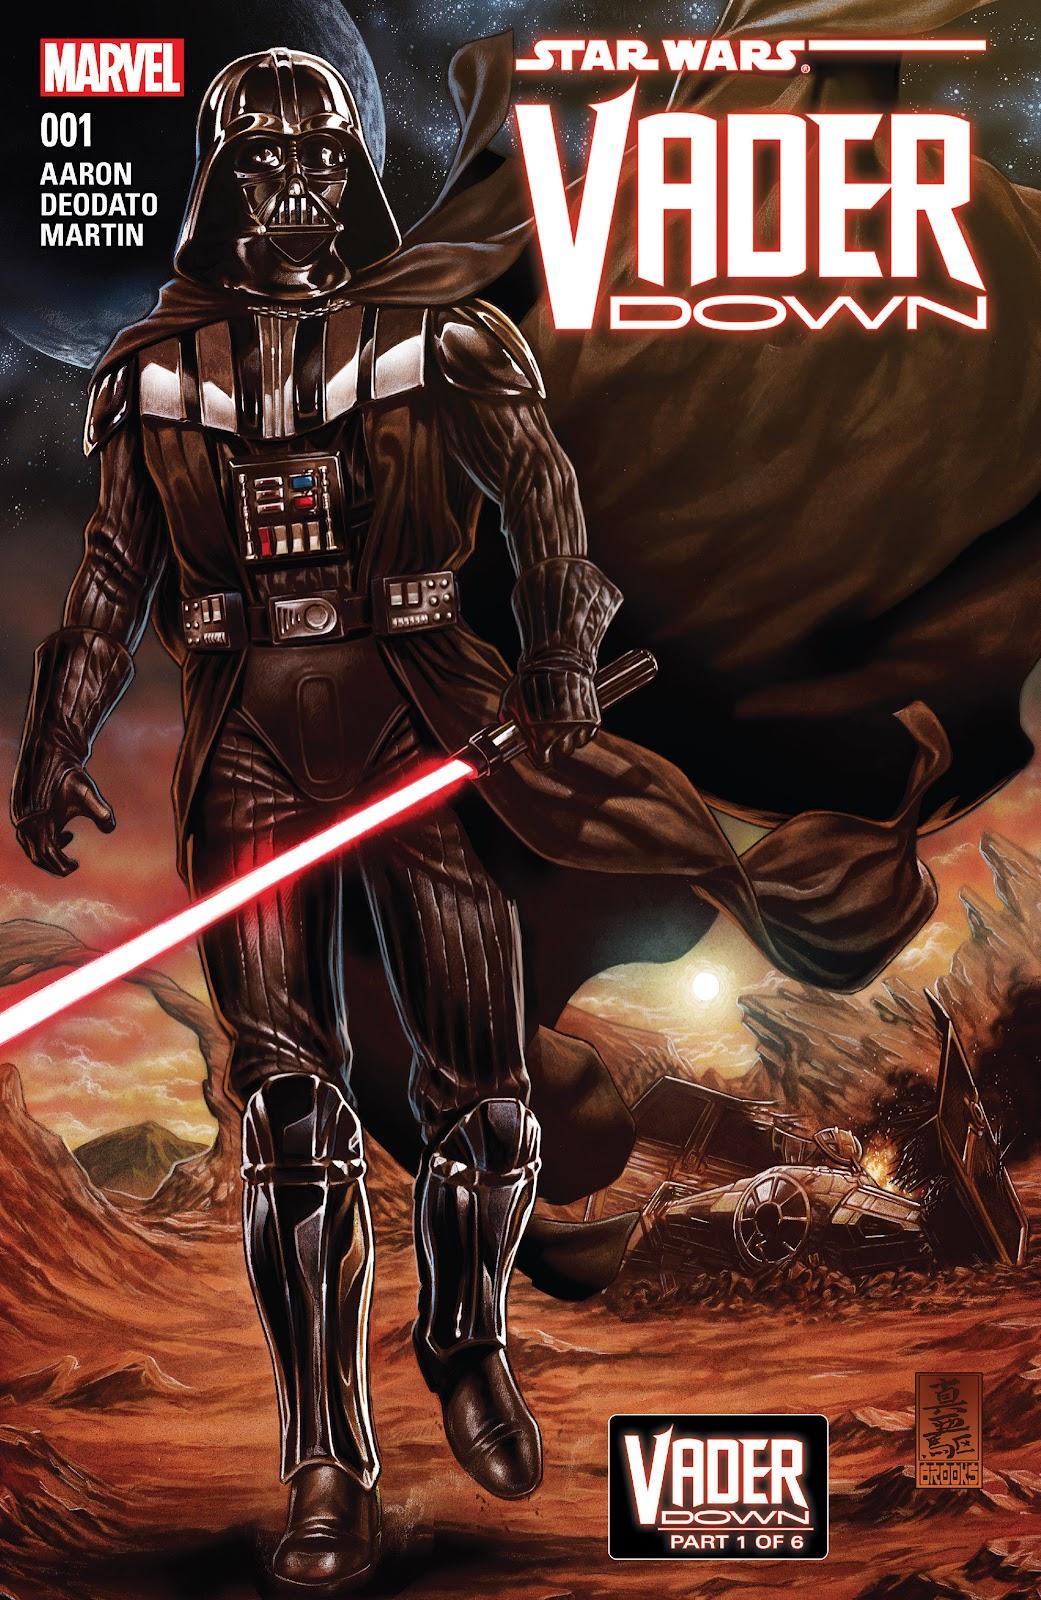 Star Wars: Vader Down 1 Page 1